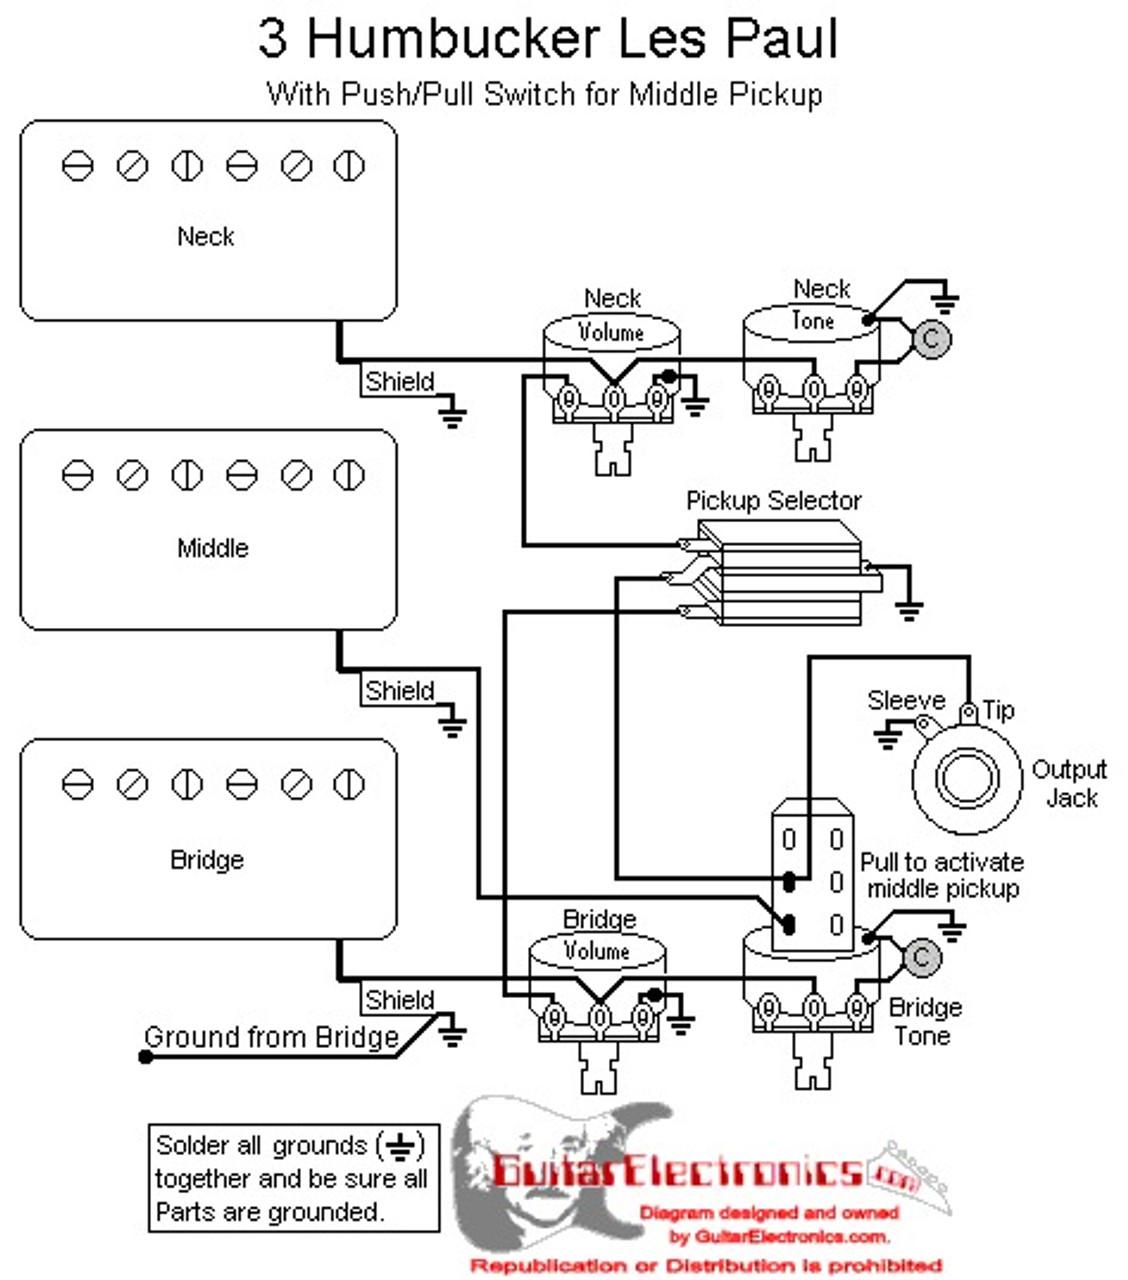 small resolution of le paul 3 humbucker wiring diagram